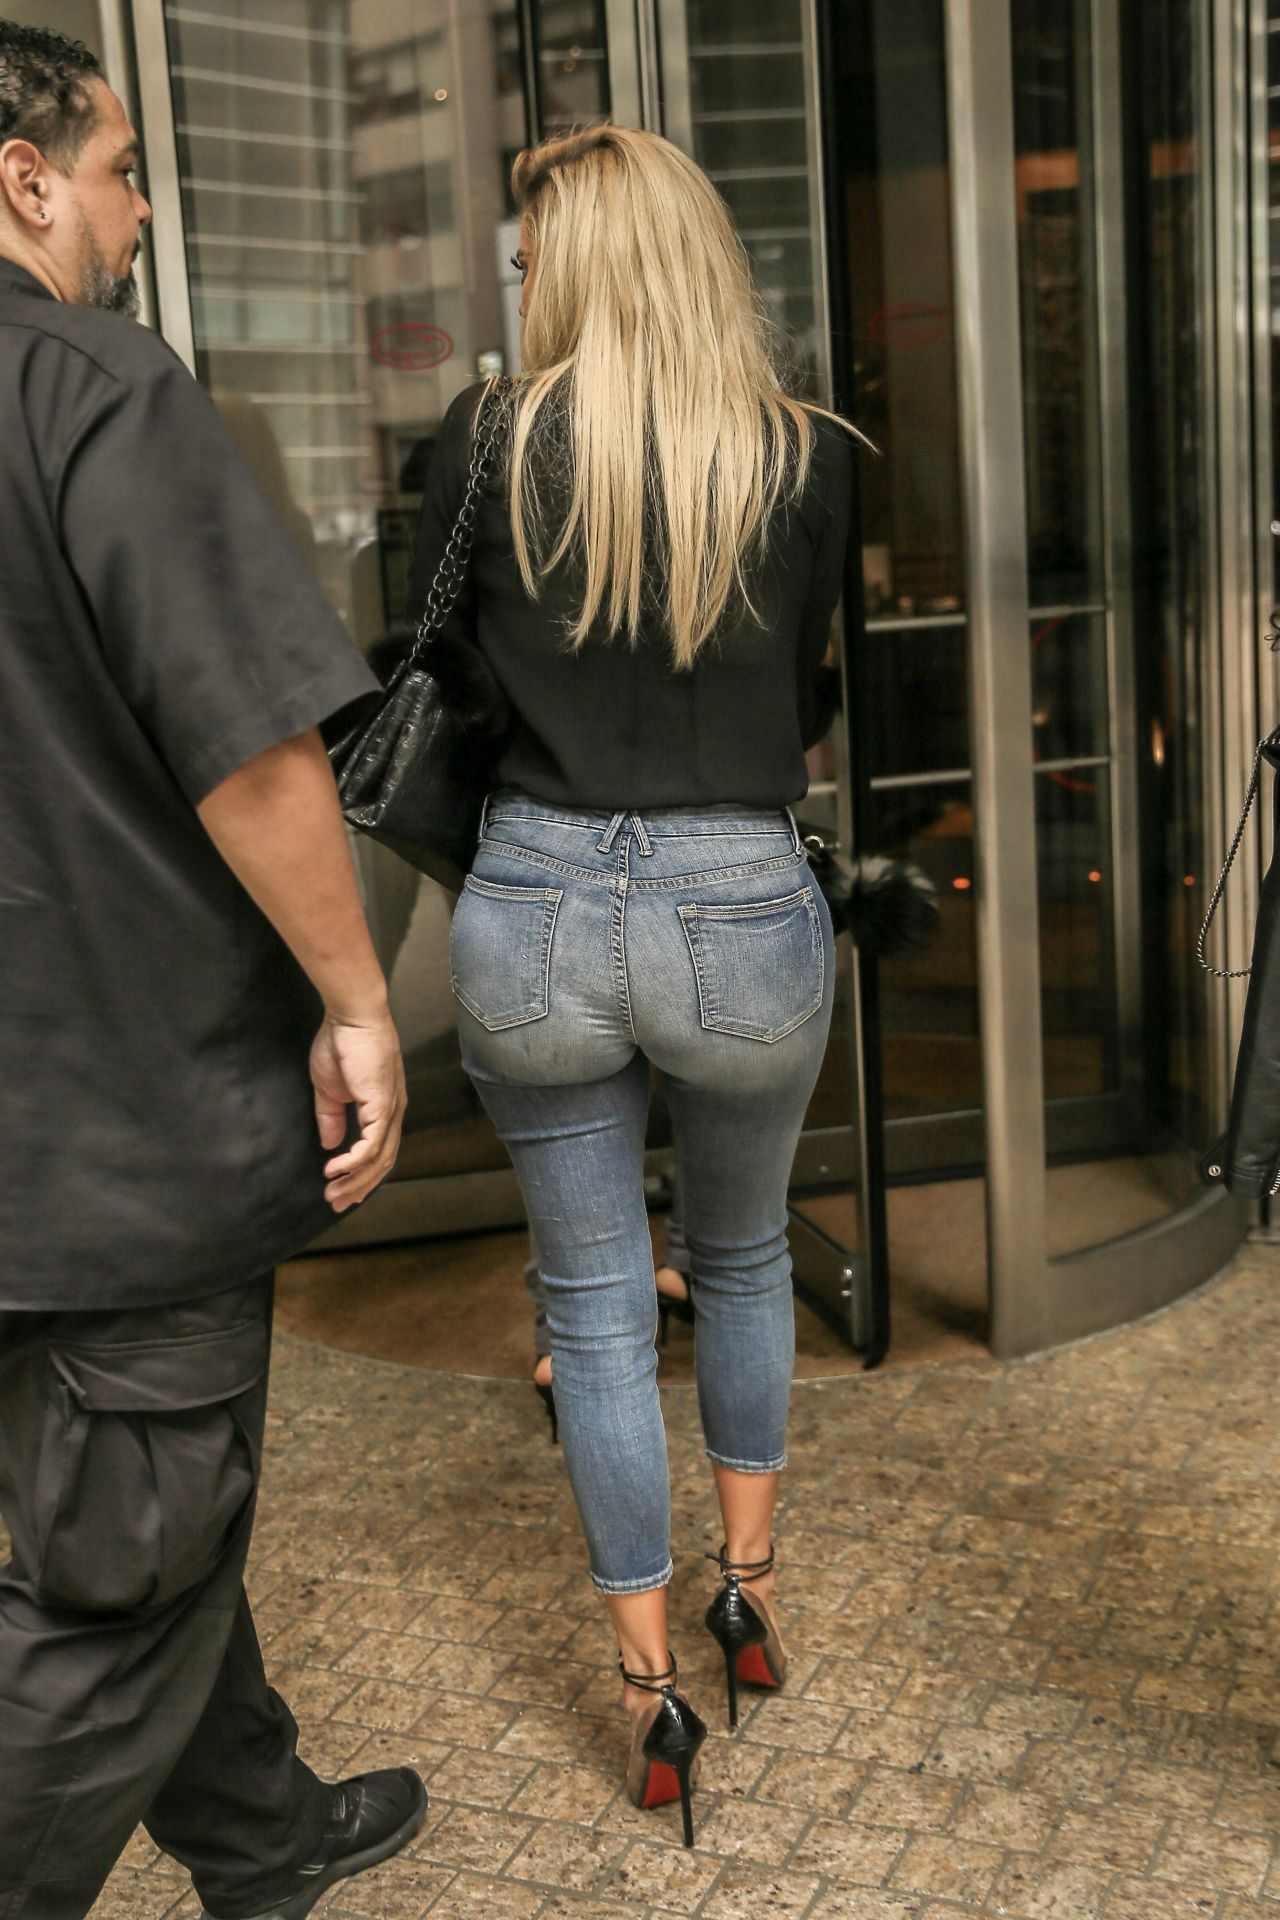 Khloe Kardashian In Tight Jeans Promoting Her Denim Line